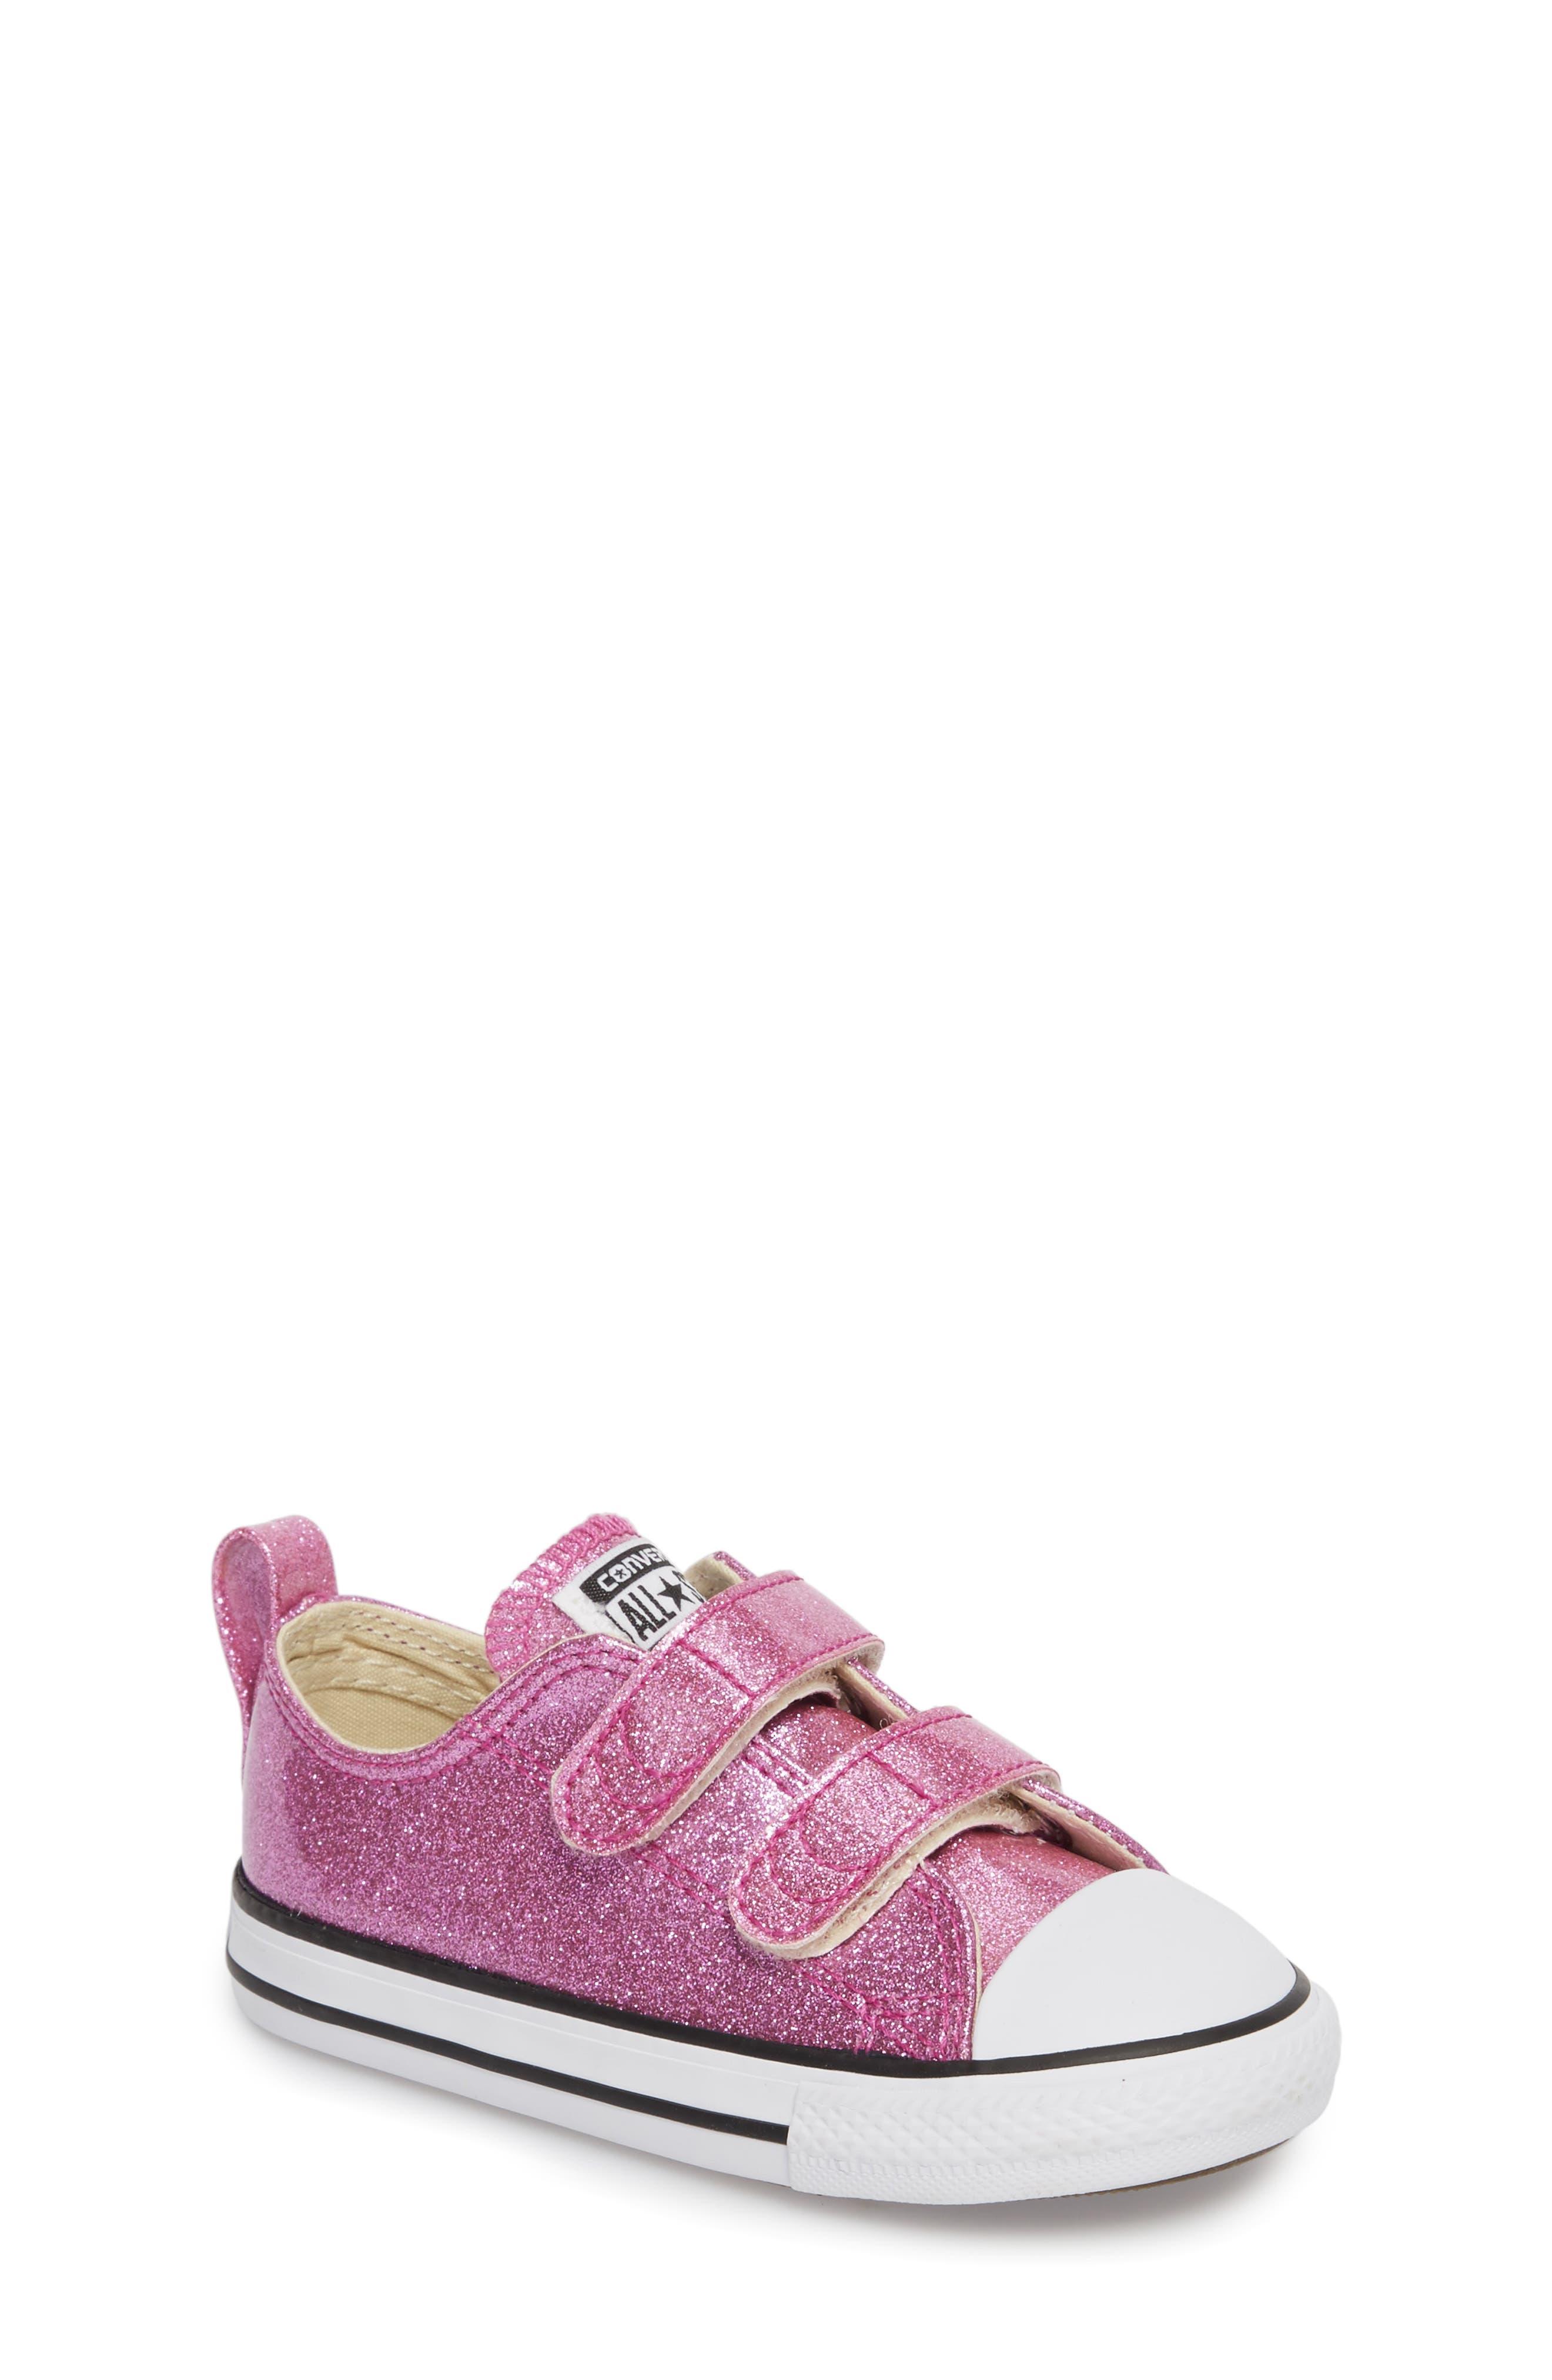 All Star<sup>®</sup> Seasonal Glitter Sneaker,                             Main thumbnail 1, color,                             Bright Violet